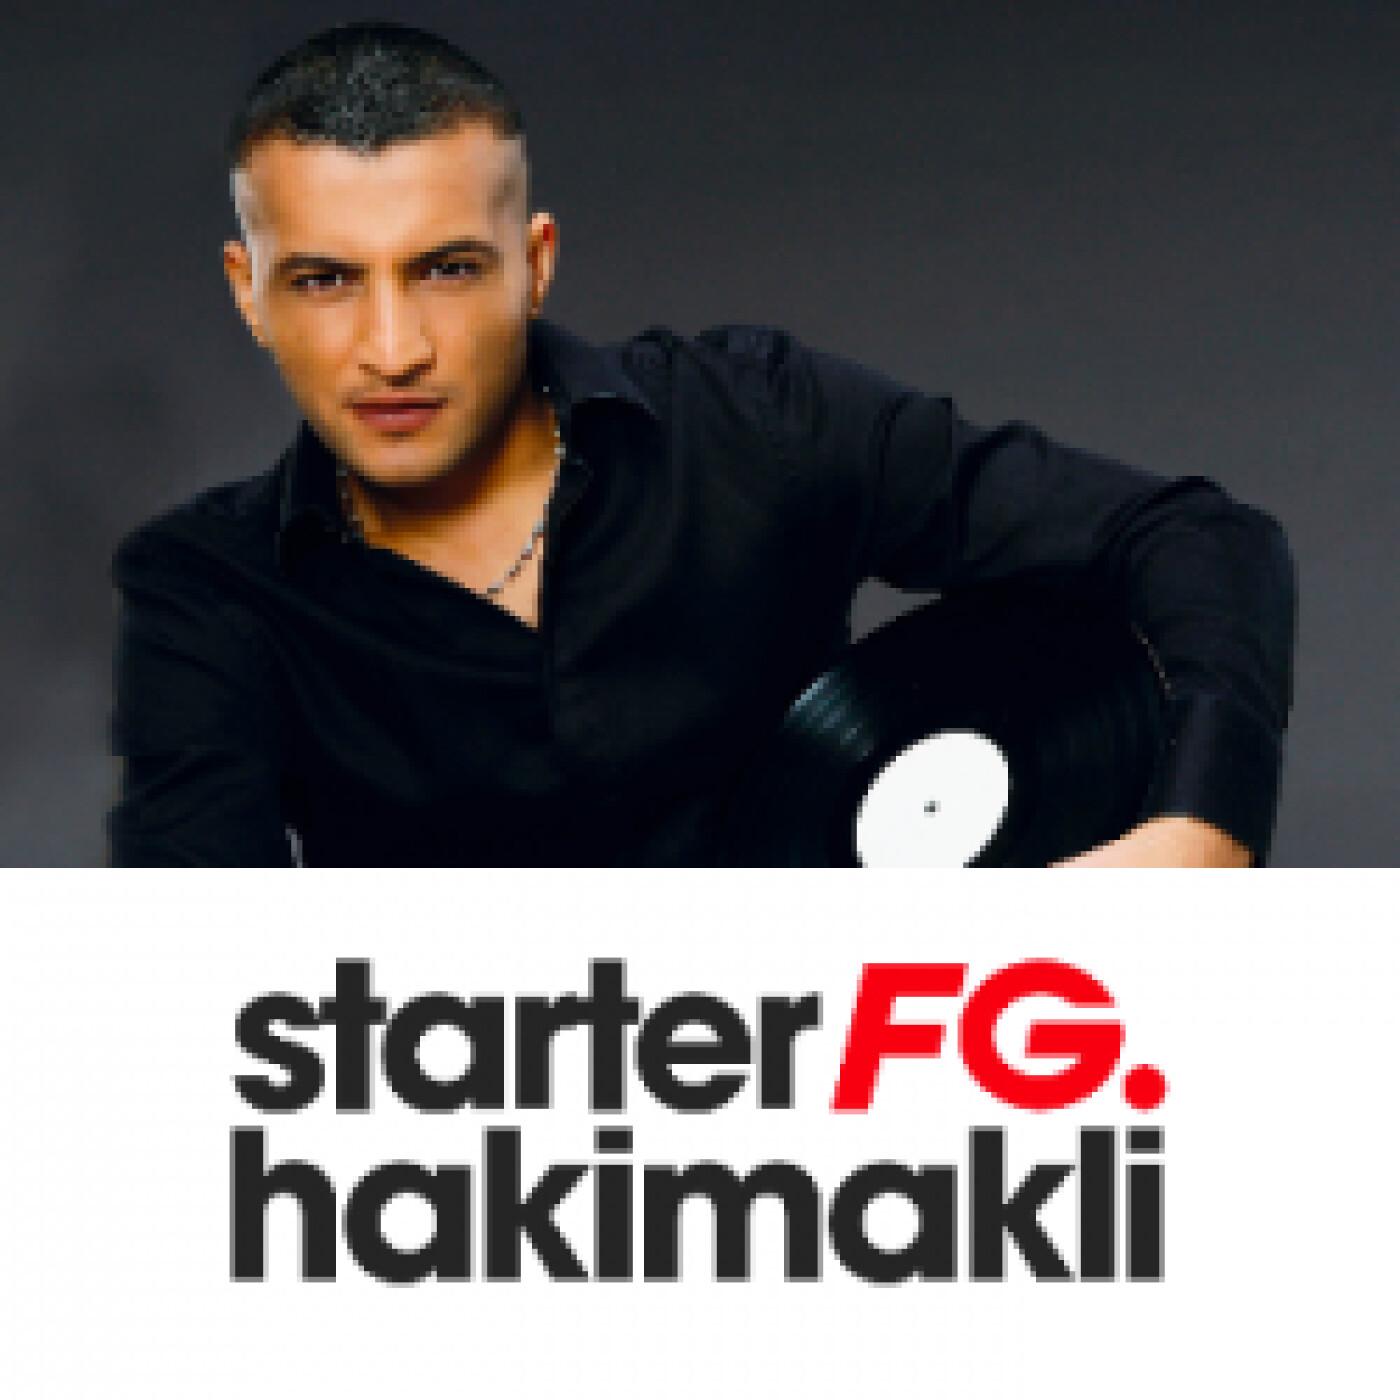 STARTER FG BY HAKIMAKLI MARDI 16 MARS 2021